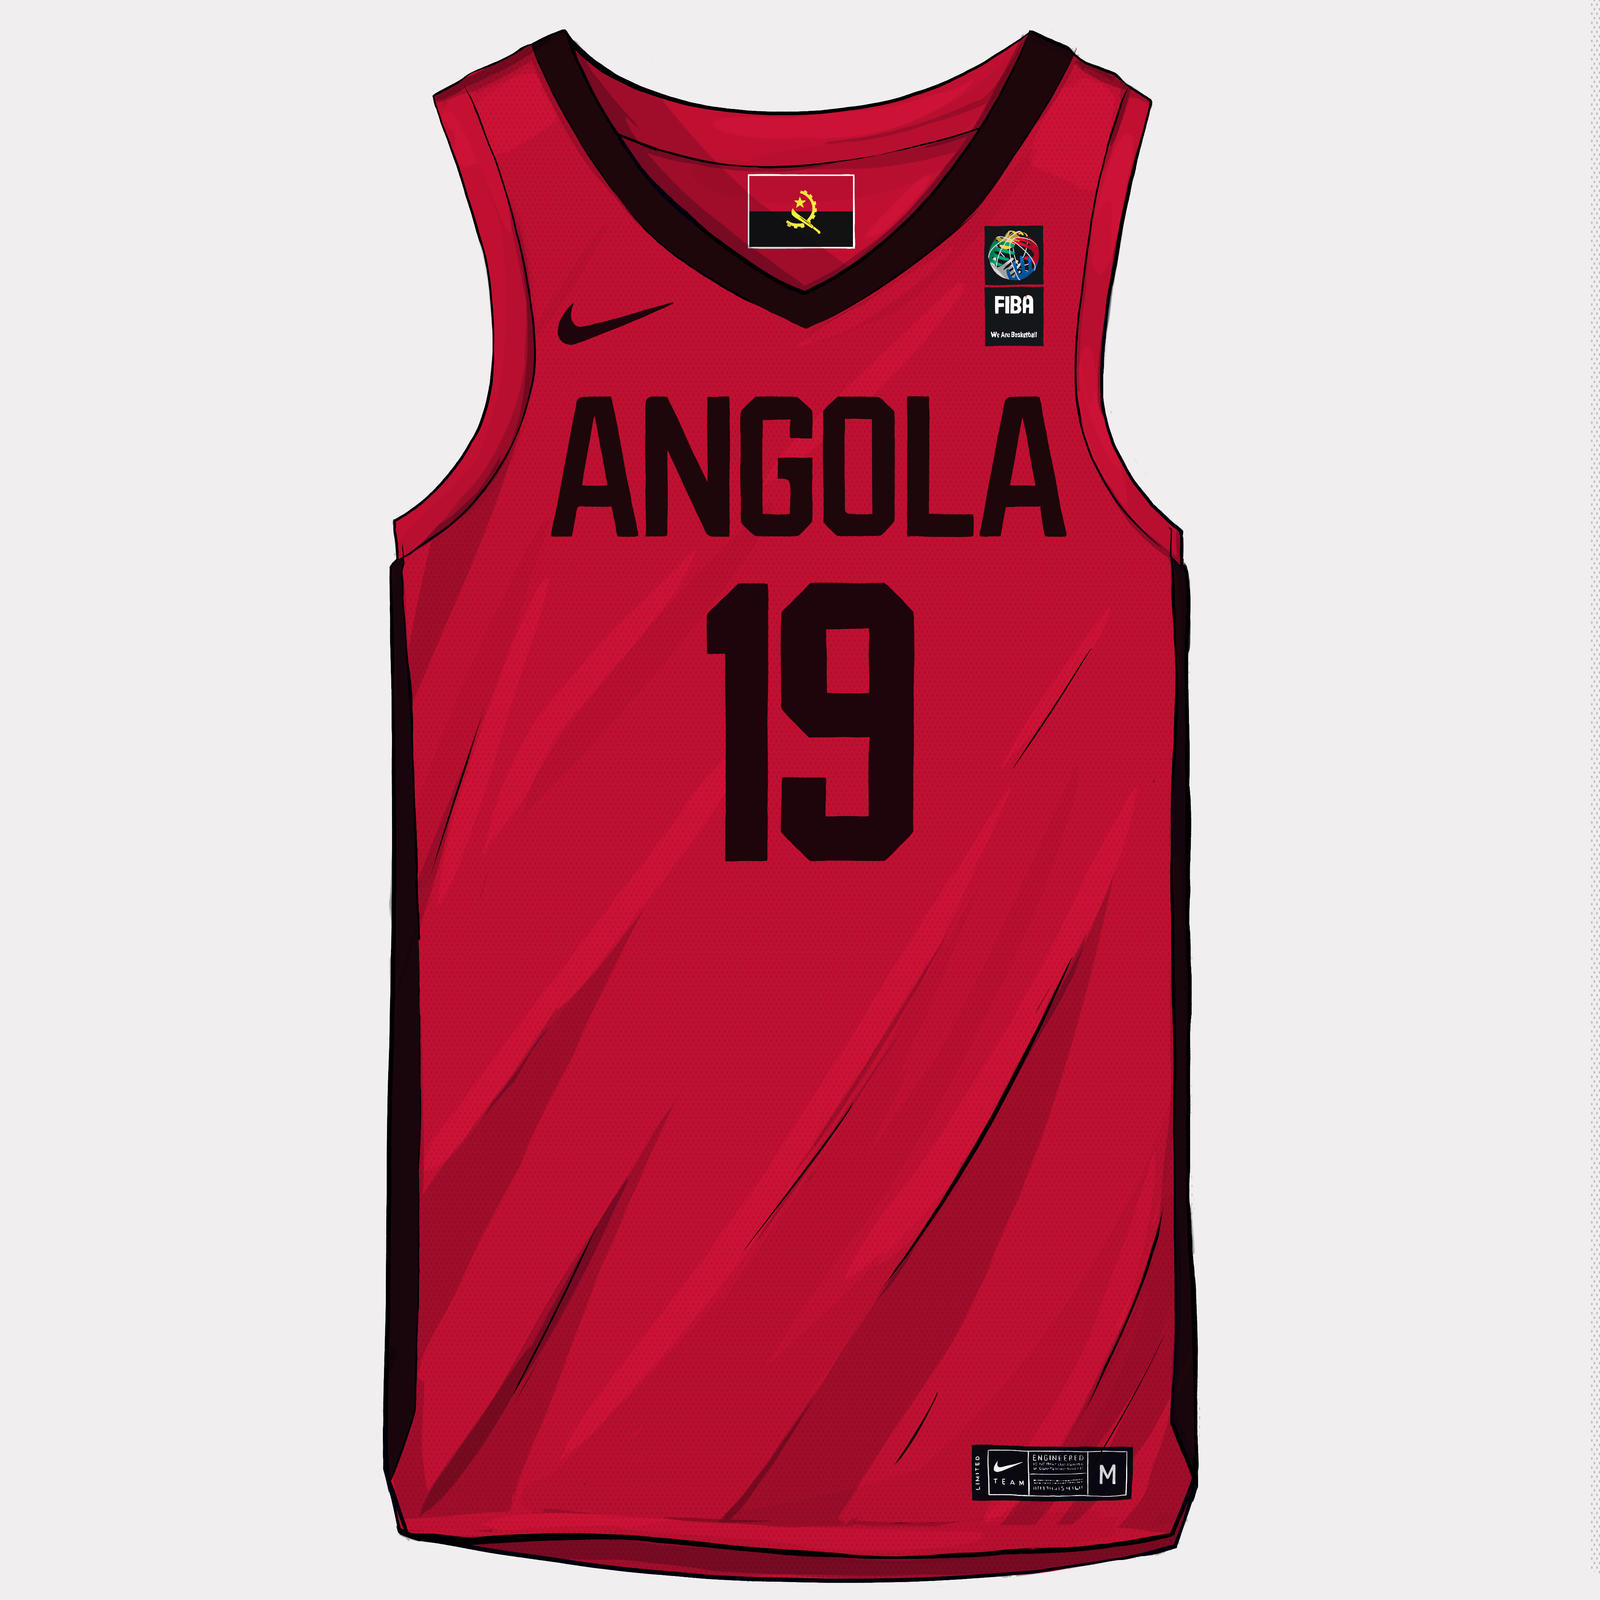 nike-news-angola-national-team-kit-2019-illustration-1x1_1_89528.jpg